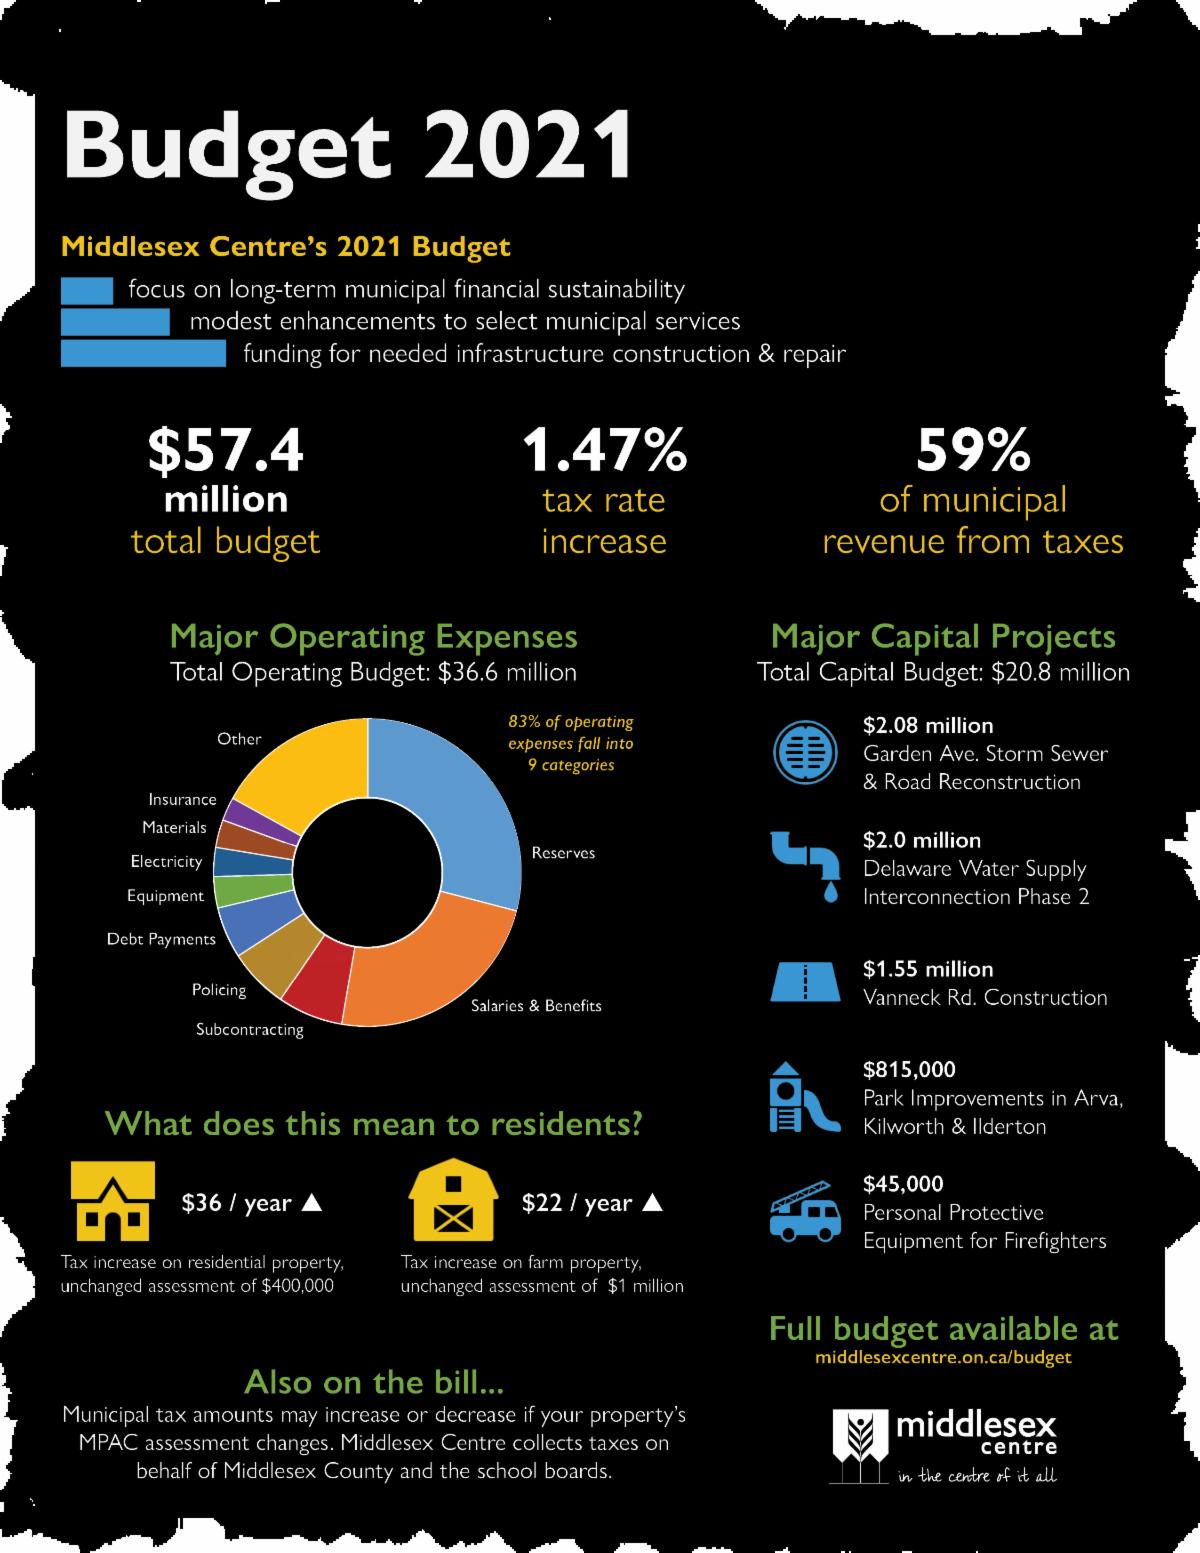 Budget 2021 Infographic